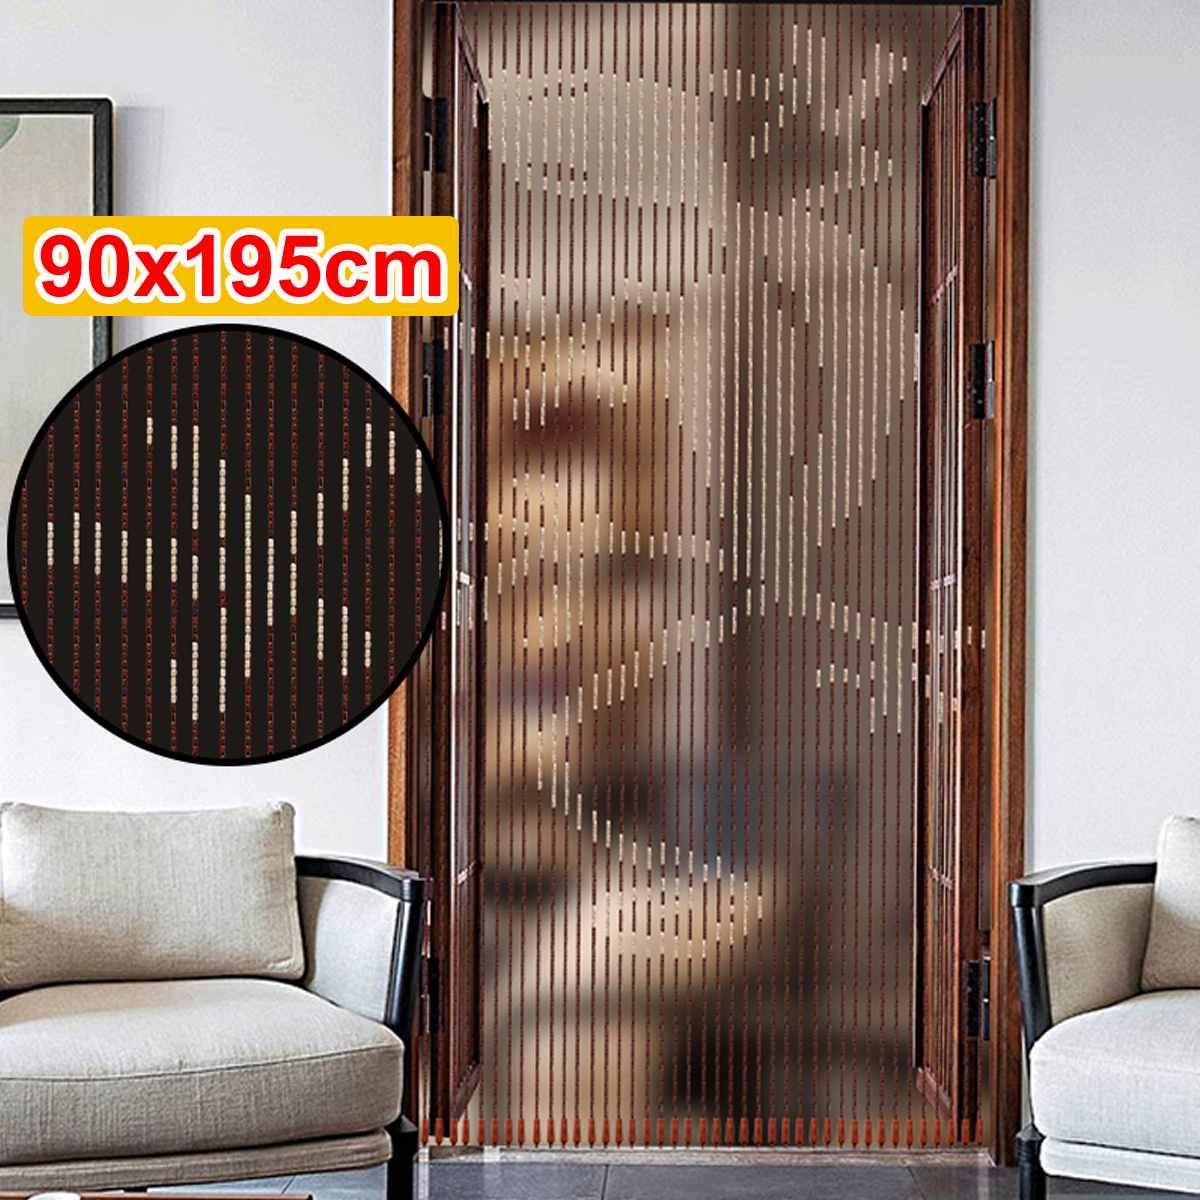 Persianas de madera hechas a mano, 90x195cm, 41 líneas, cortinas de cuentas de madera con mosquitera, divisor de puerta para pasillo, sala de estar, puerta o ventana